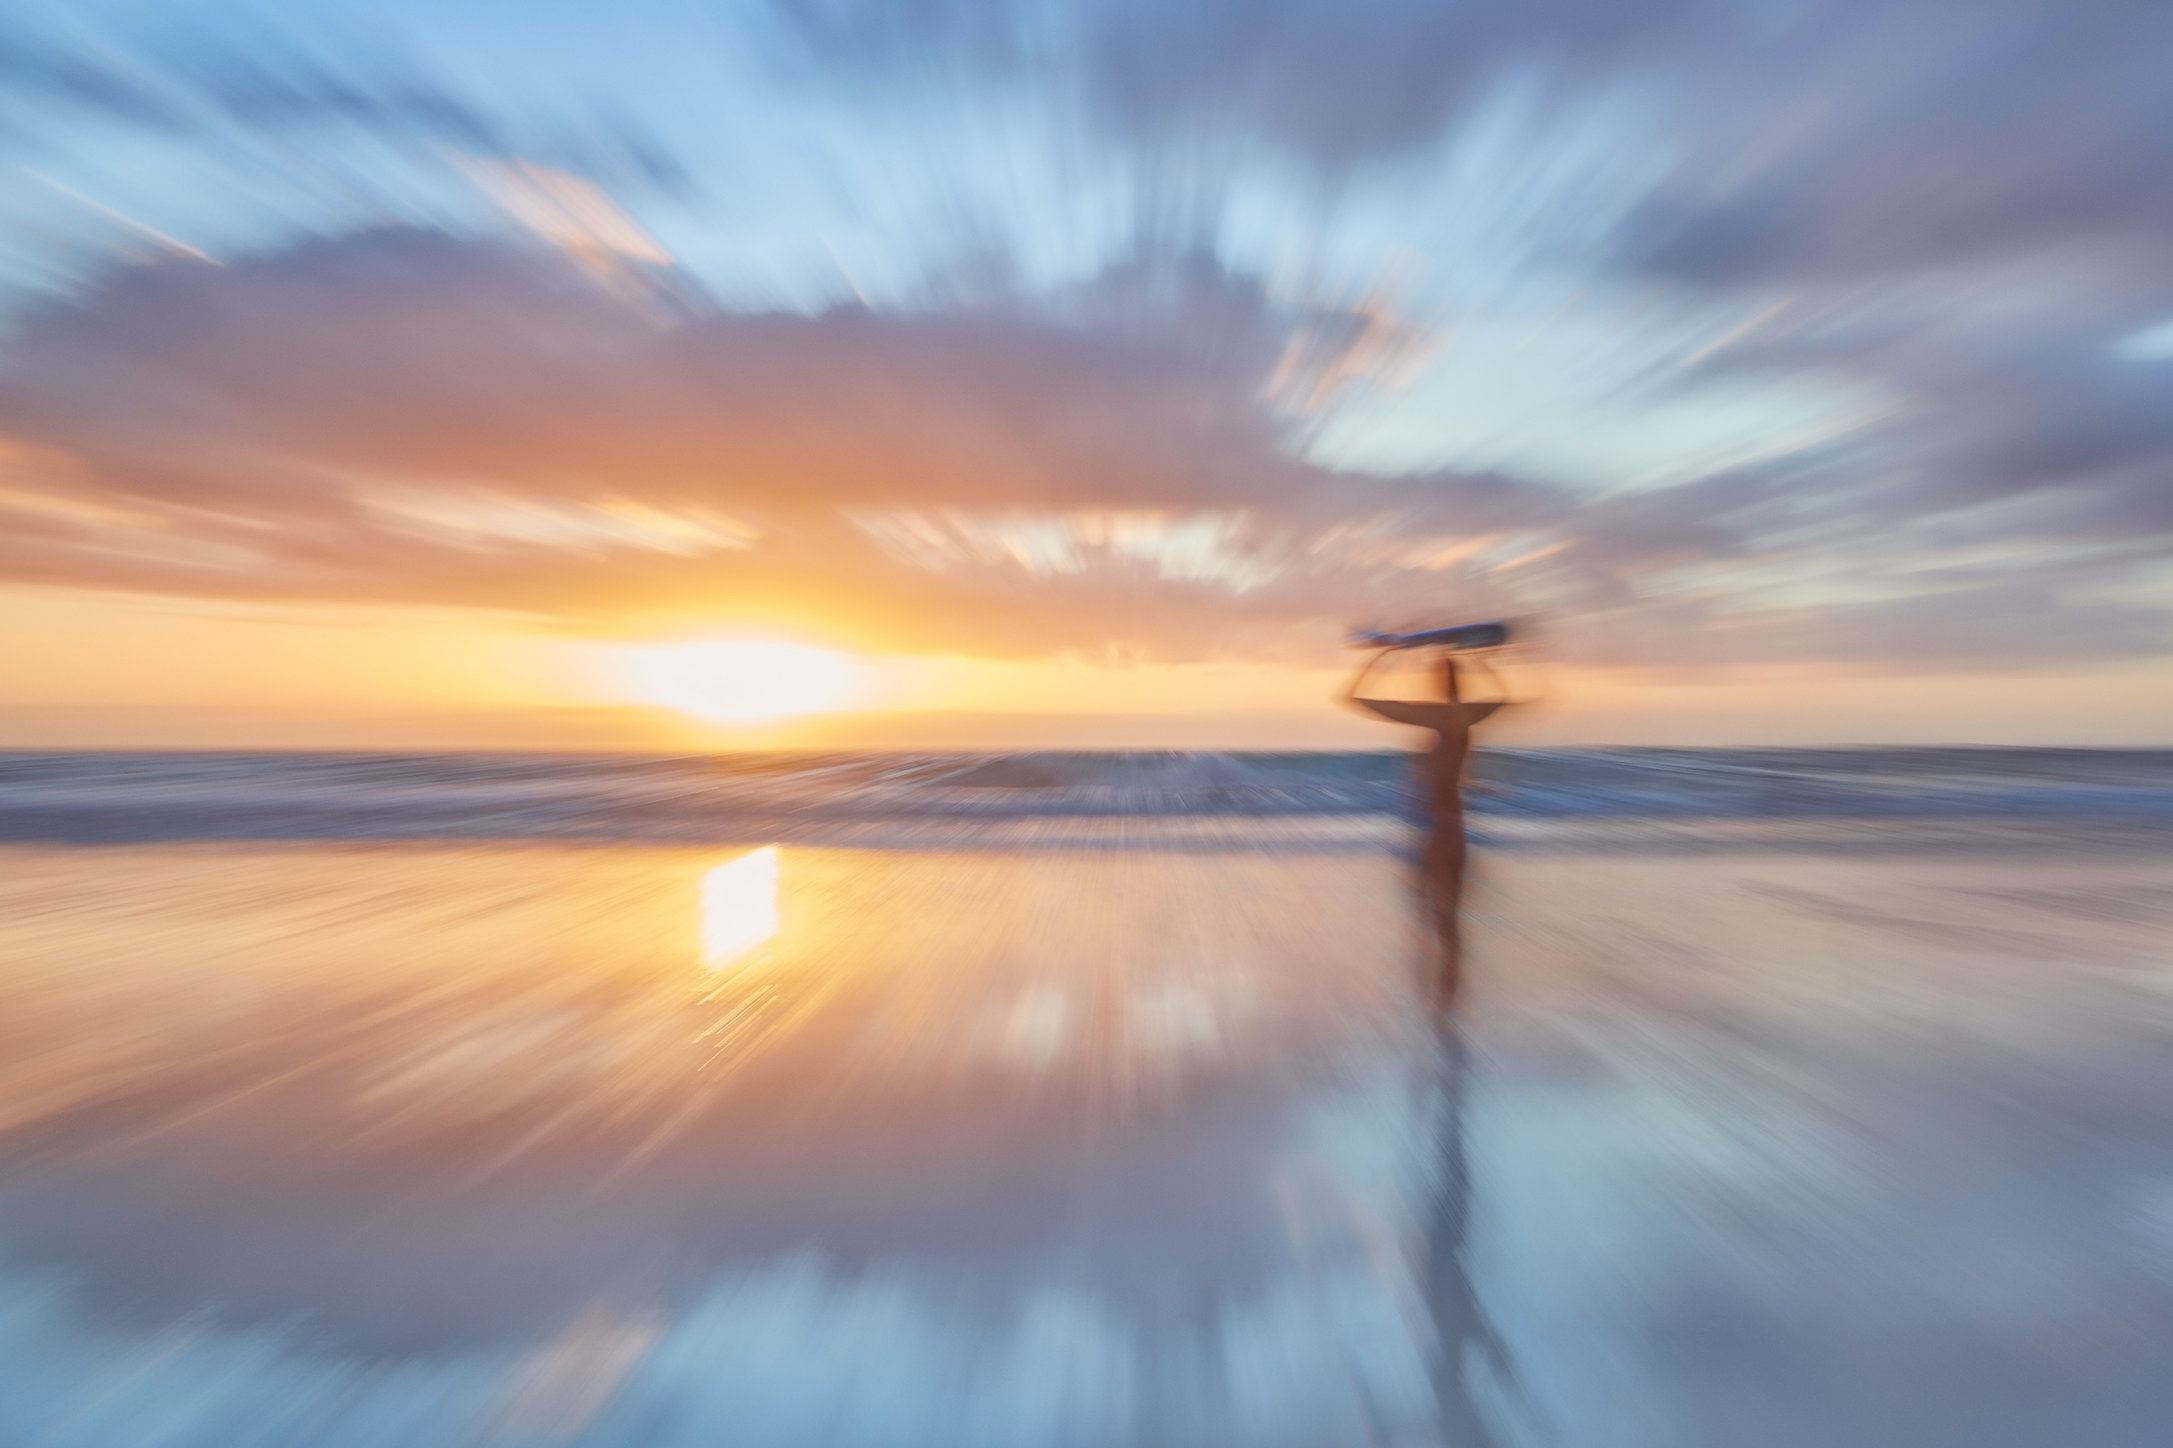 California Dreamin / If everybody had an ocean